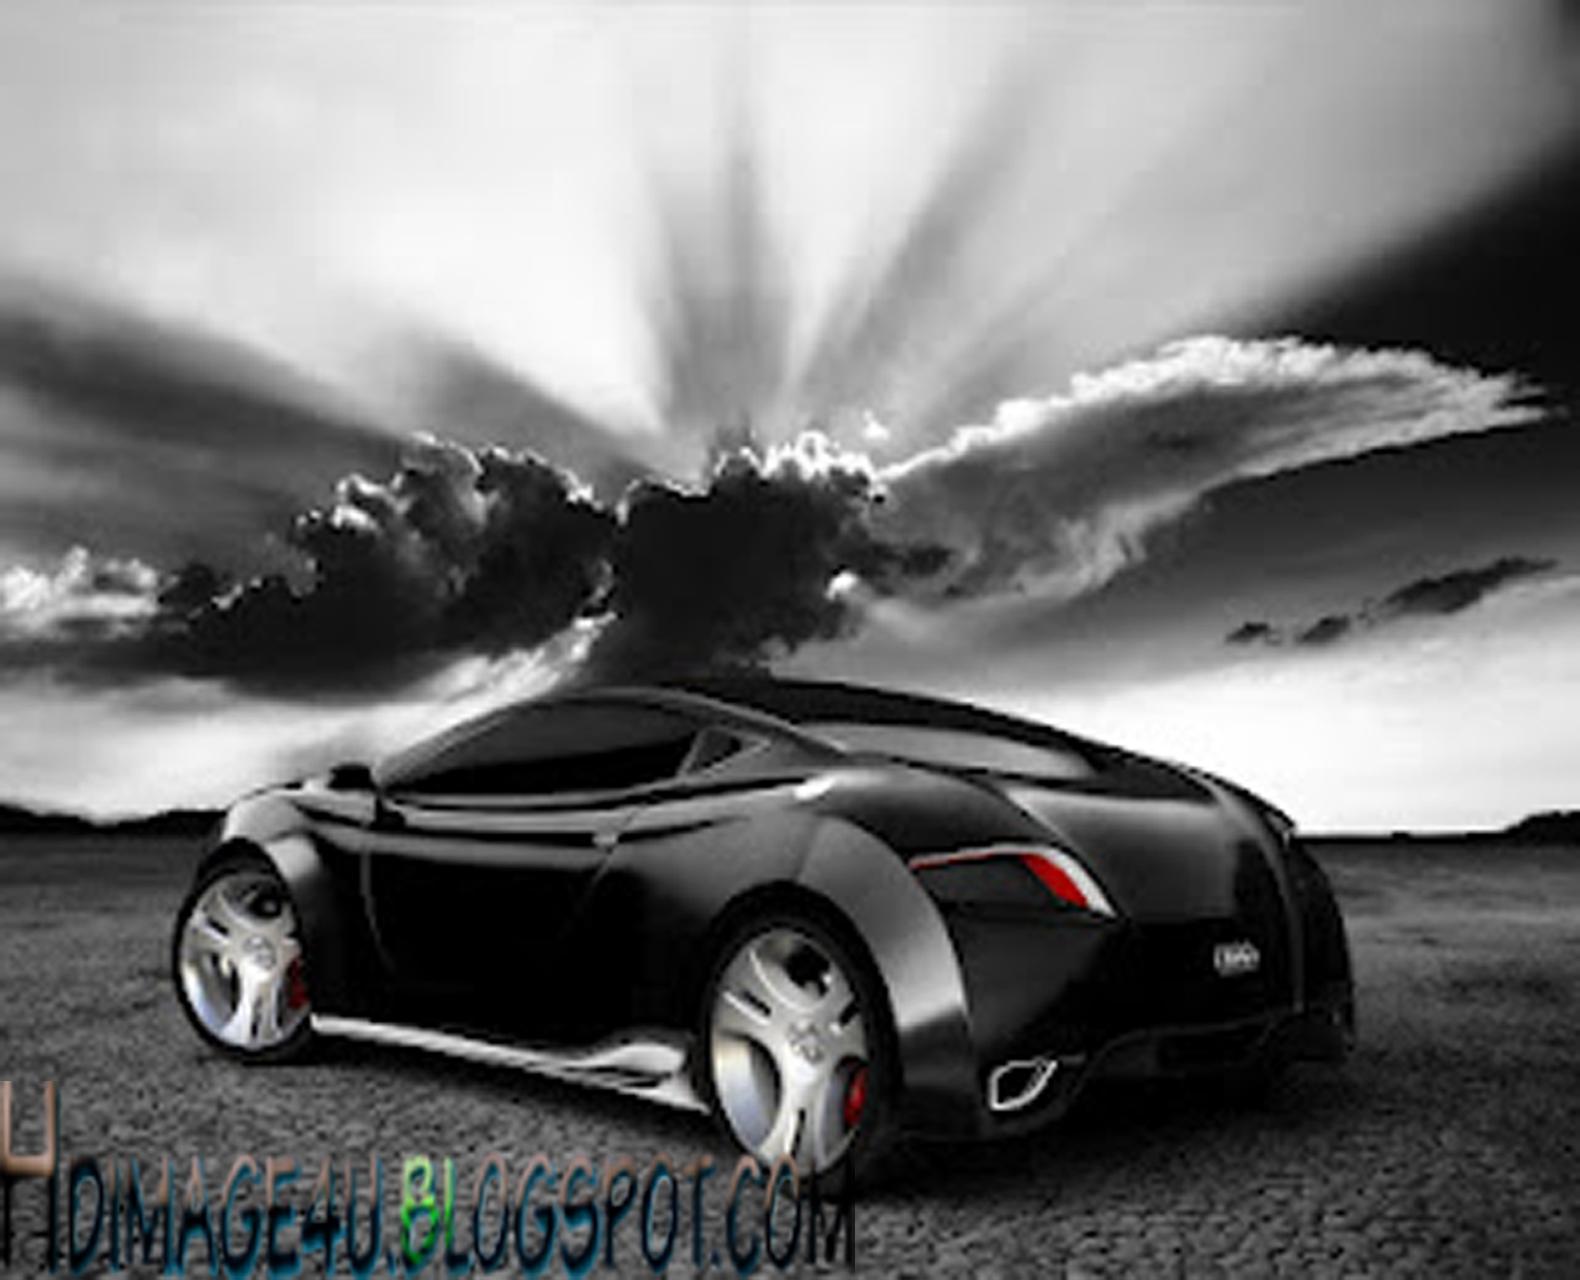 http://4.bp.blogspot.com/-A1fII8m0Wss/T6YvTff-5sI/AAAAAAAACUk/mV0qABQkLUw/s1600/Amazing-Cars-HD-wallpaper--+100+1+copy.jpg